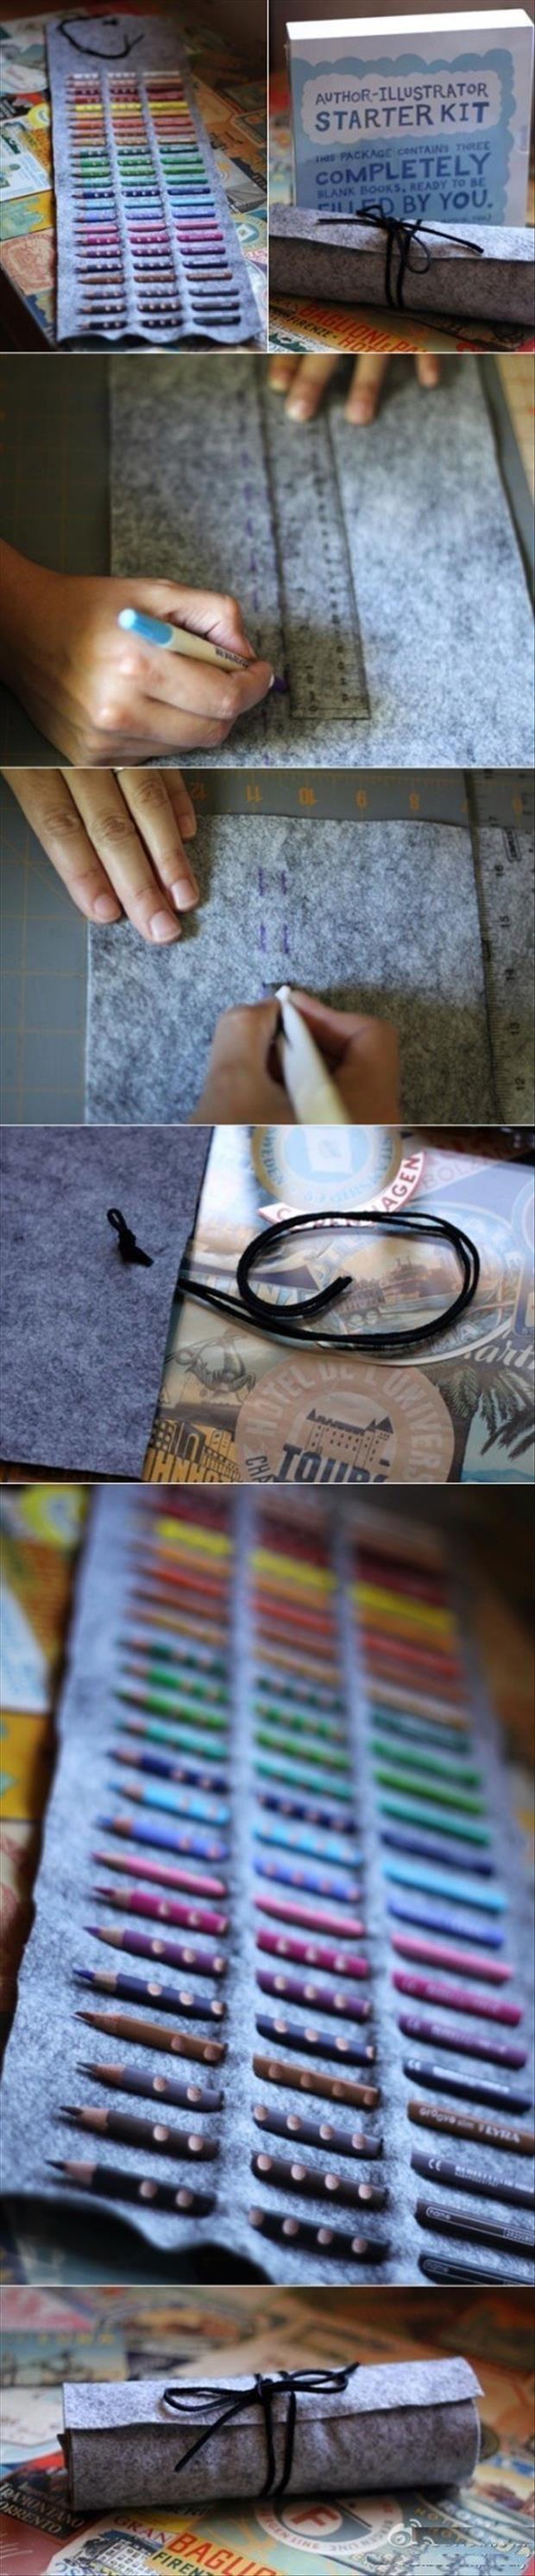 Fun Do It Yourself Craft Ideas – 60 Pics